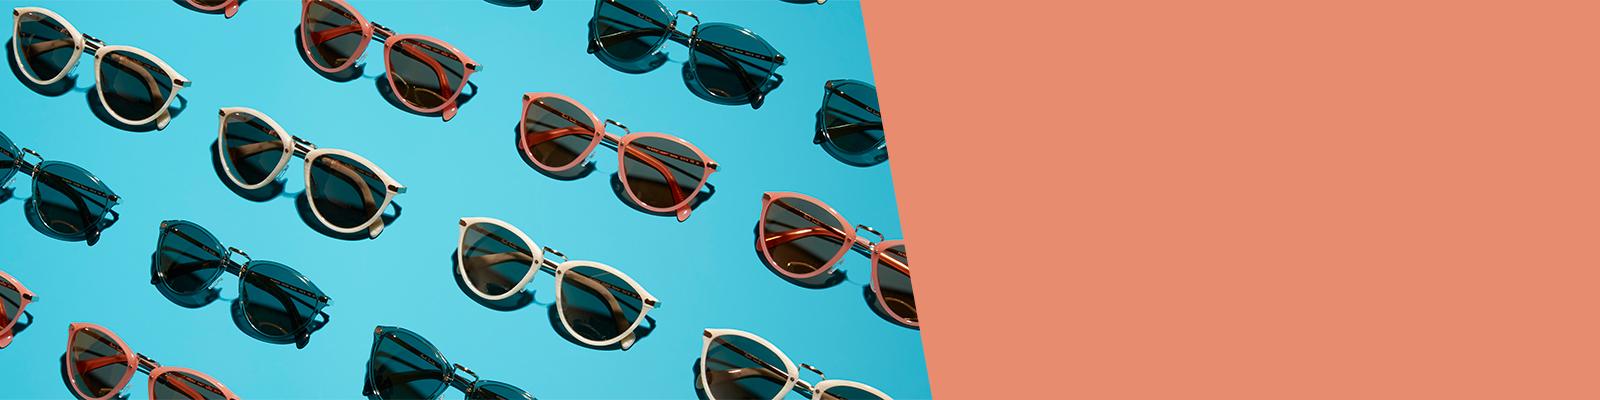 Paul Smith Sunglasses Womens  paul smith eyewear men s and women s sunglasses spectacles